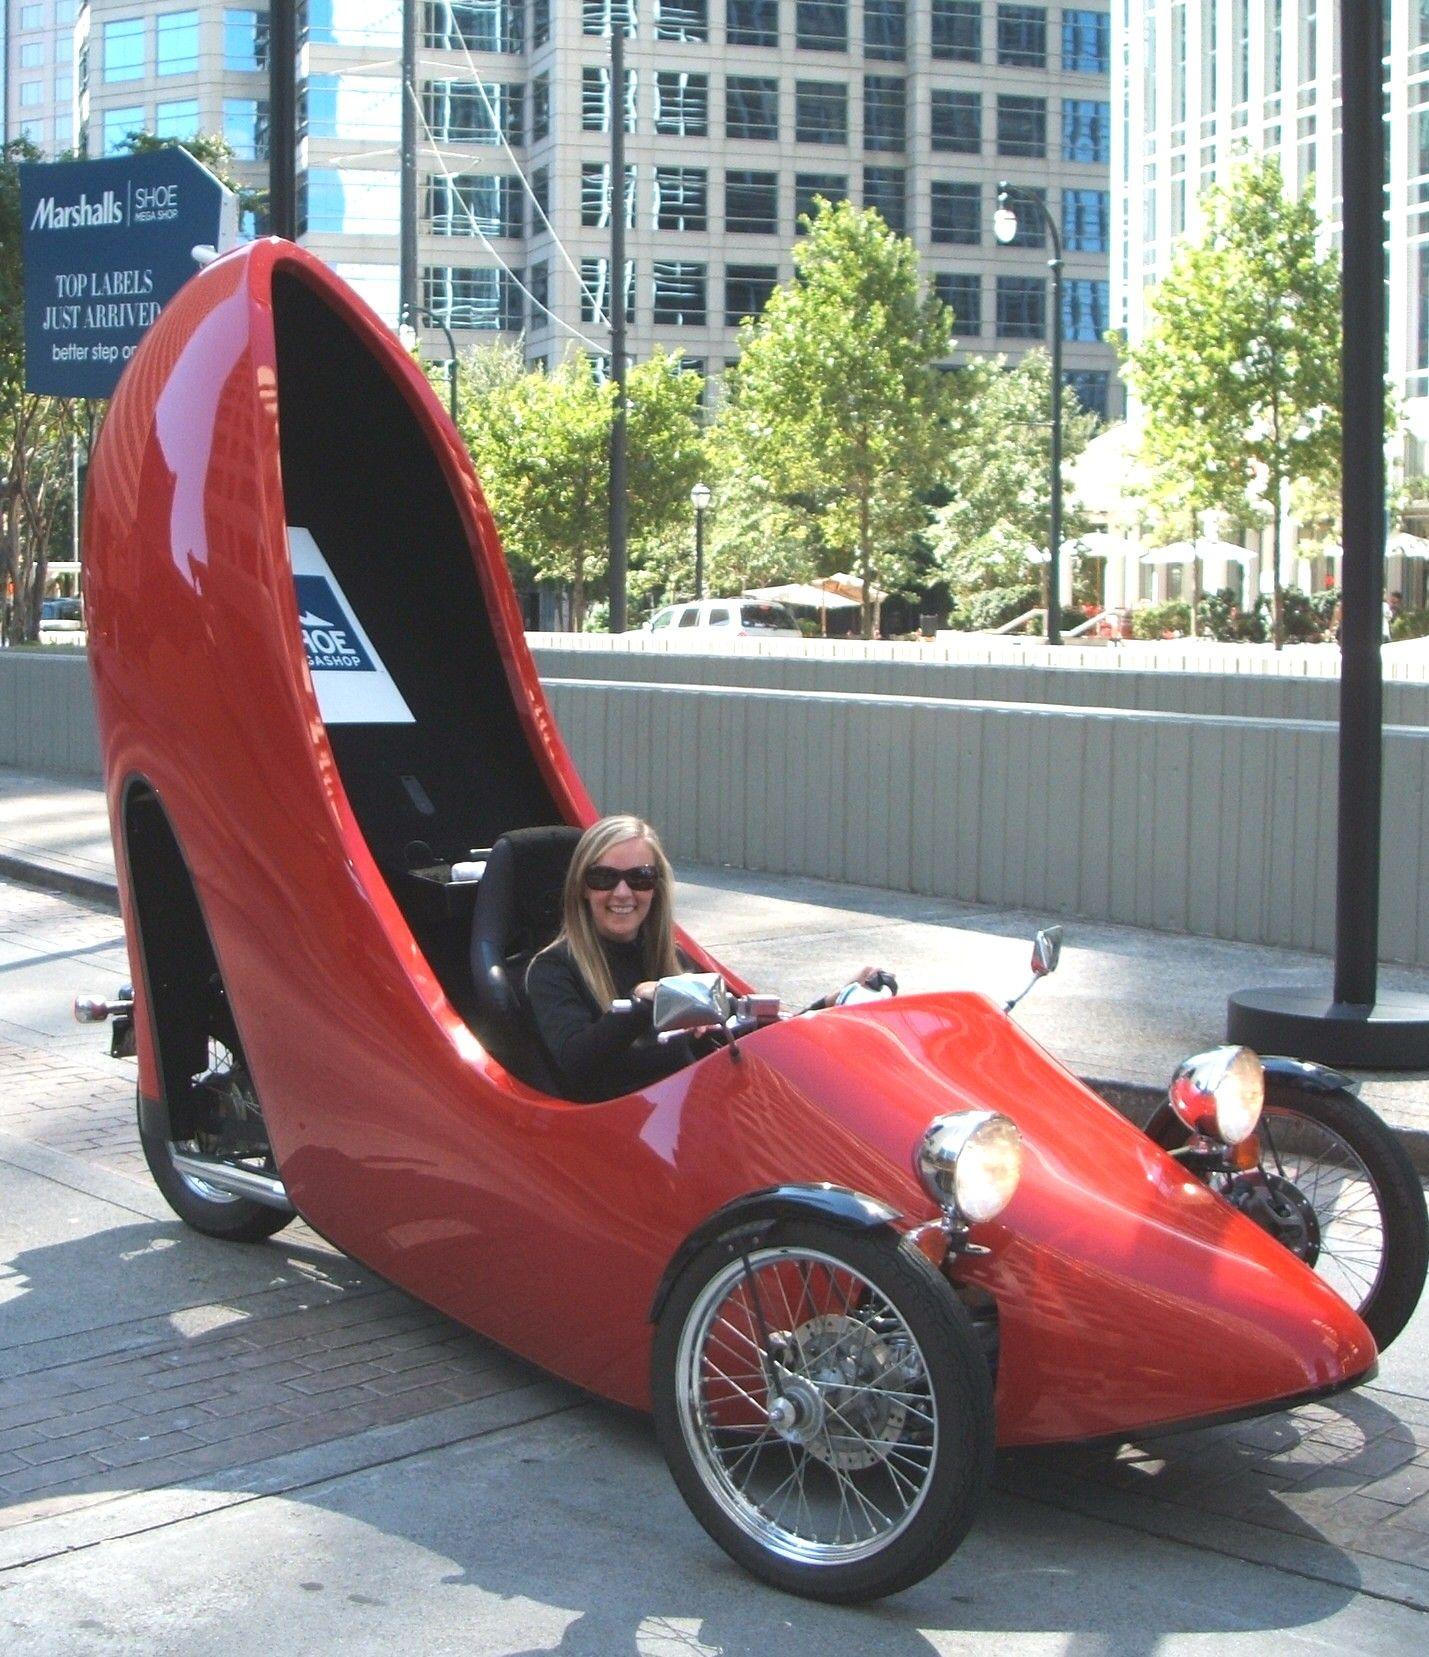 This Giant Custom Pump On Wheels Go-kart Was Motoring